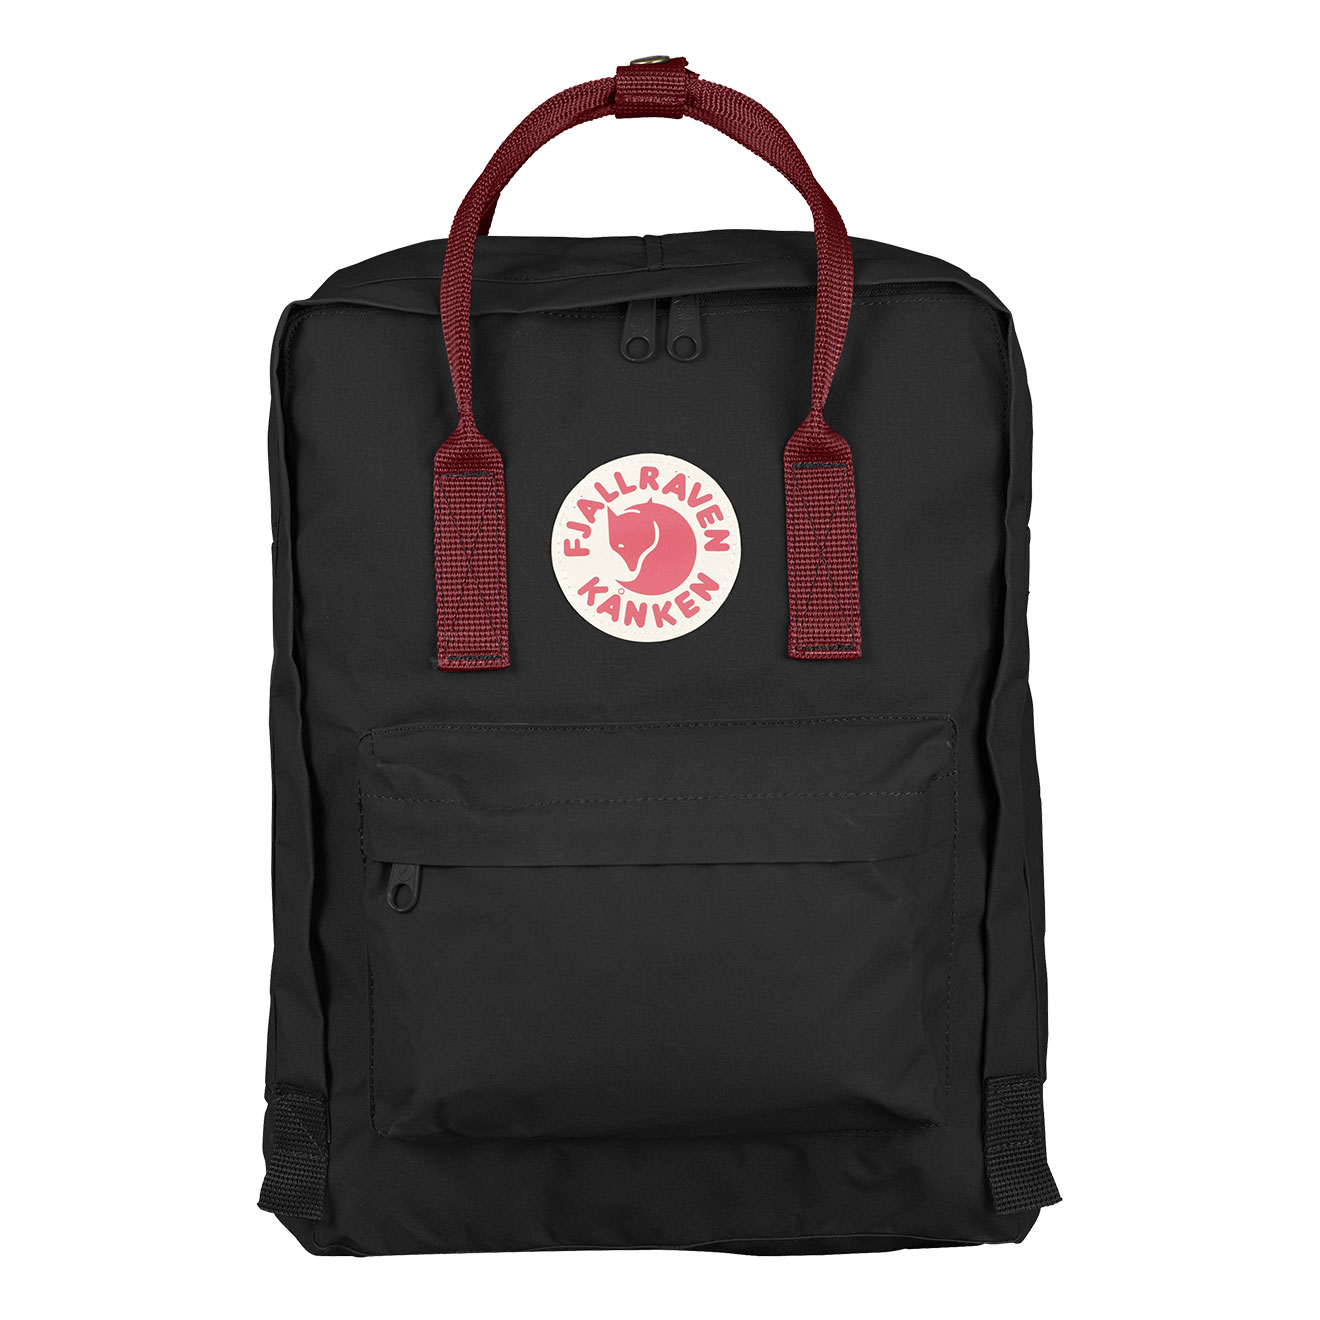 fjallraven kanken classic ox red backpack